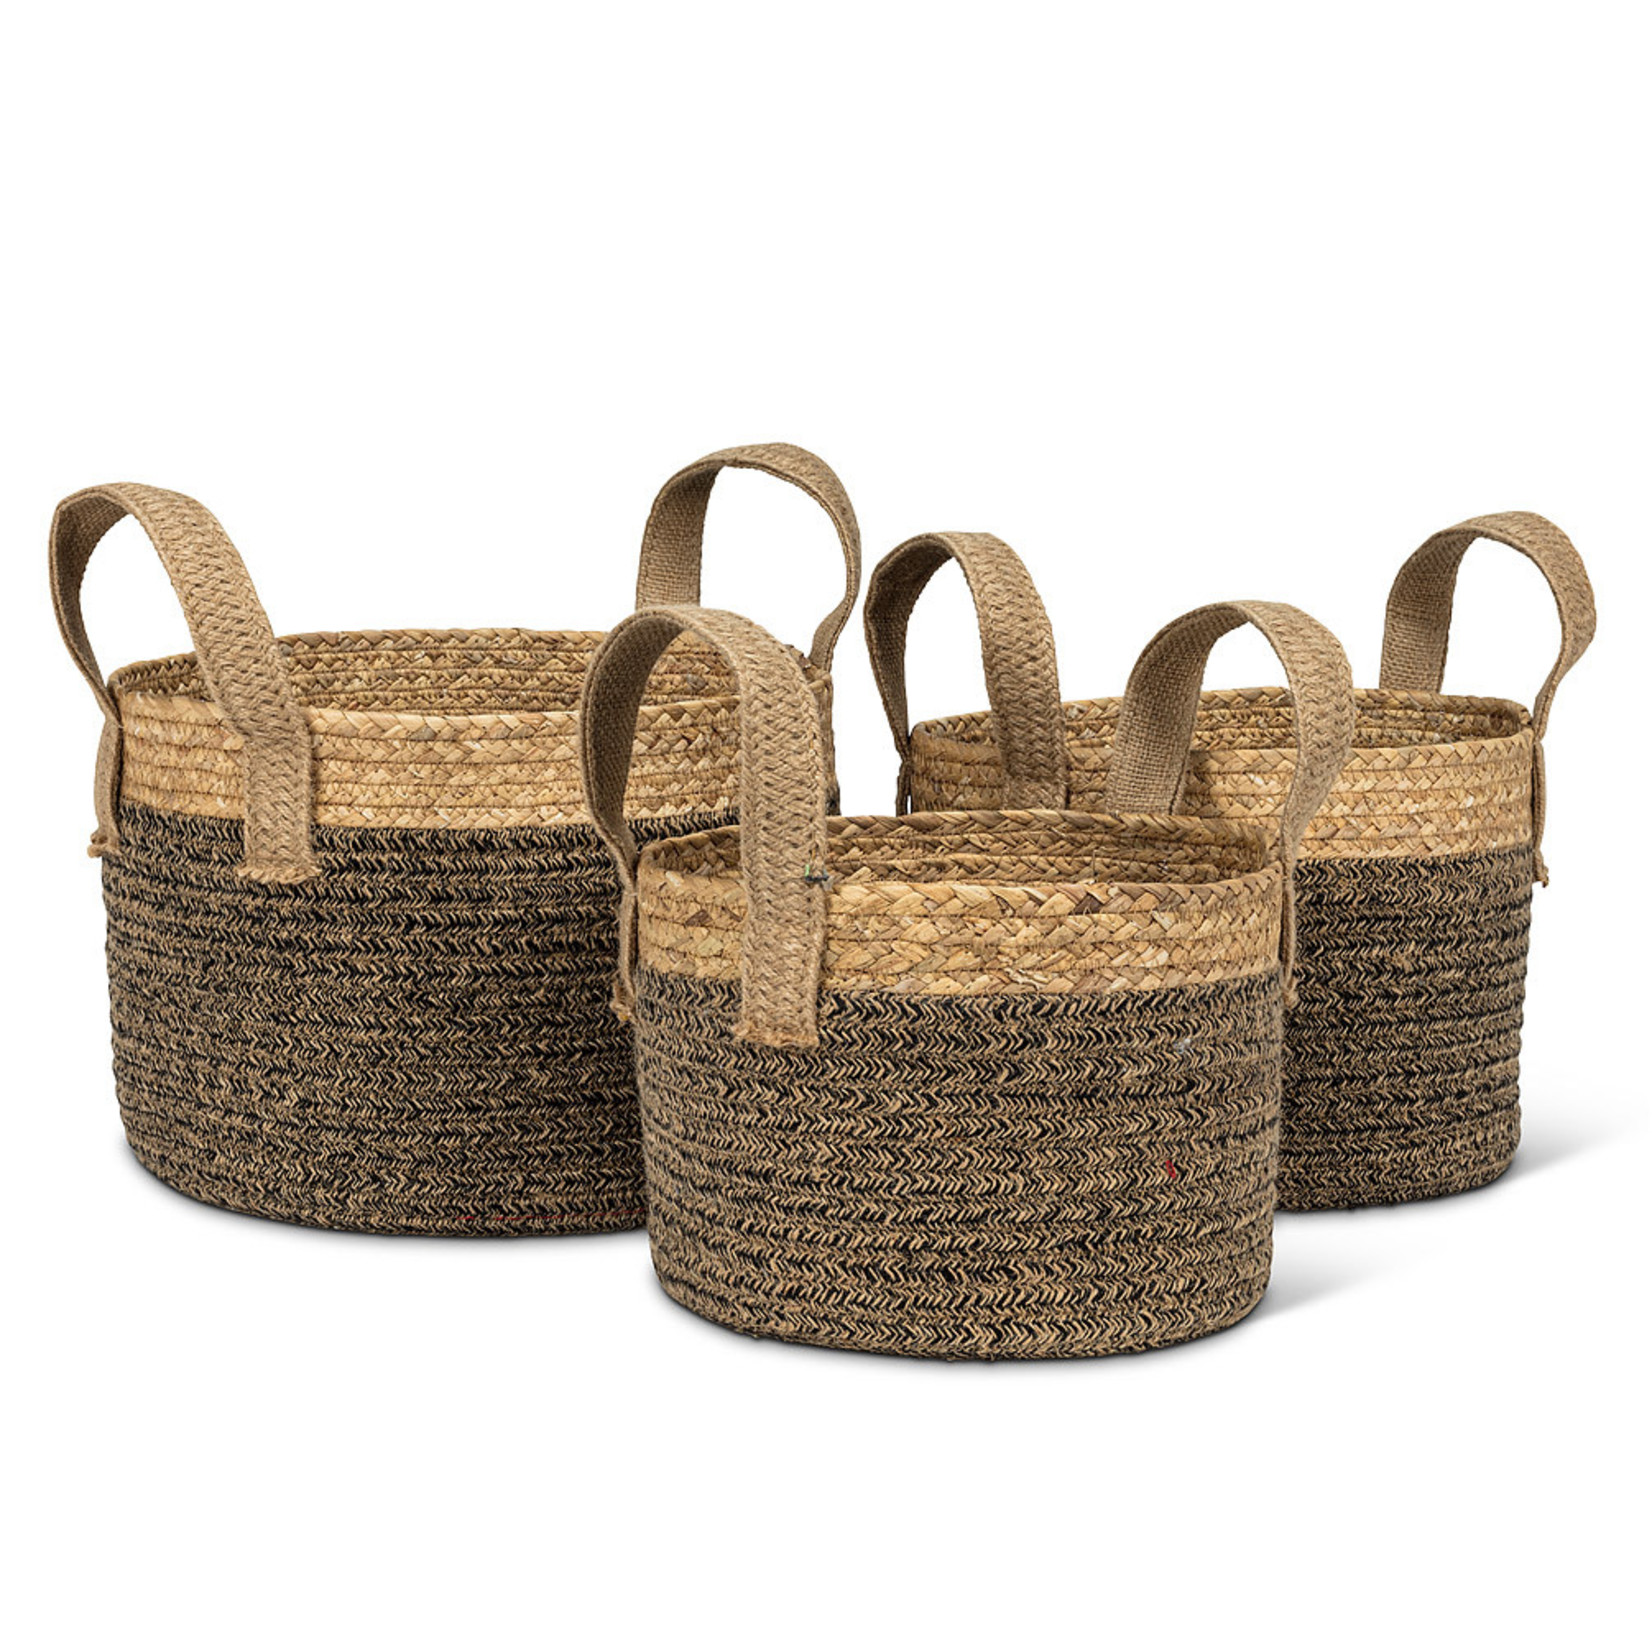 Abbott Abbott Medium Handled Basket